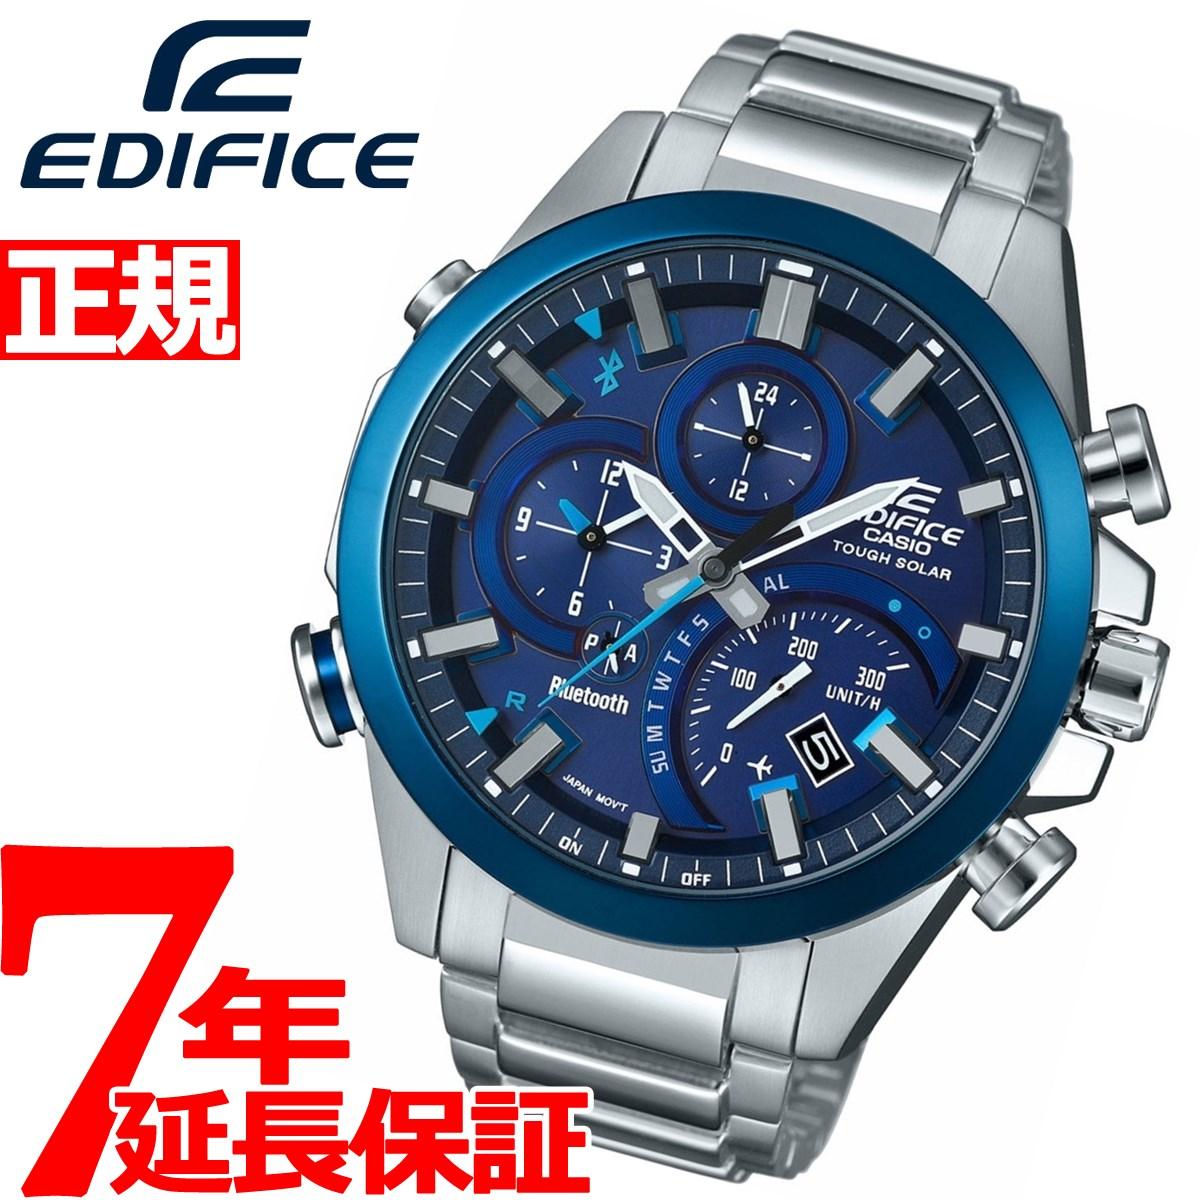 【SHOP OF THE YEAR 2018 受賞】カシオ エディフィス CASIO EDIFICE Bluetooth ブルートゥース 対応 ソーラー 腕時計 メンズ TIME TRAVELLER タフソーラー EQB-501DB-2AJF